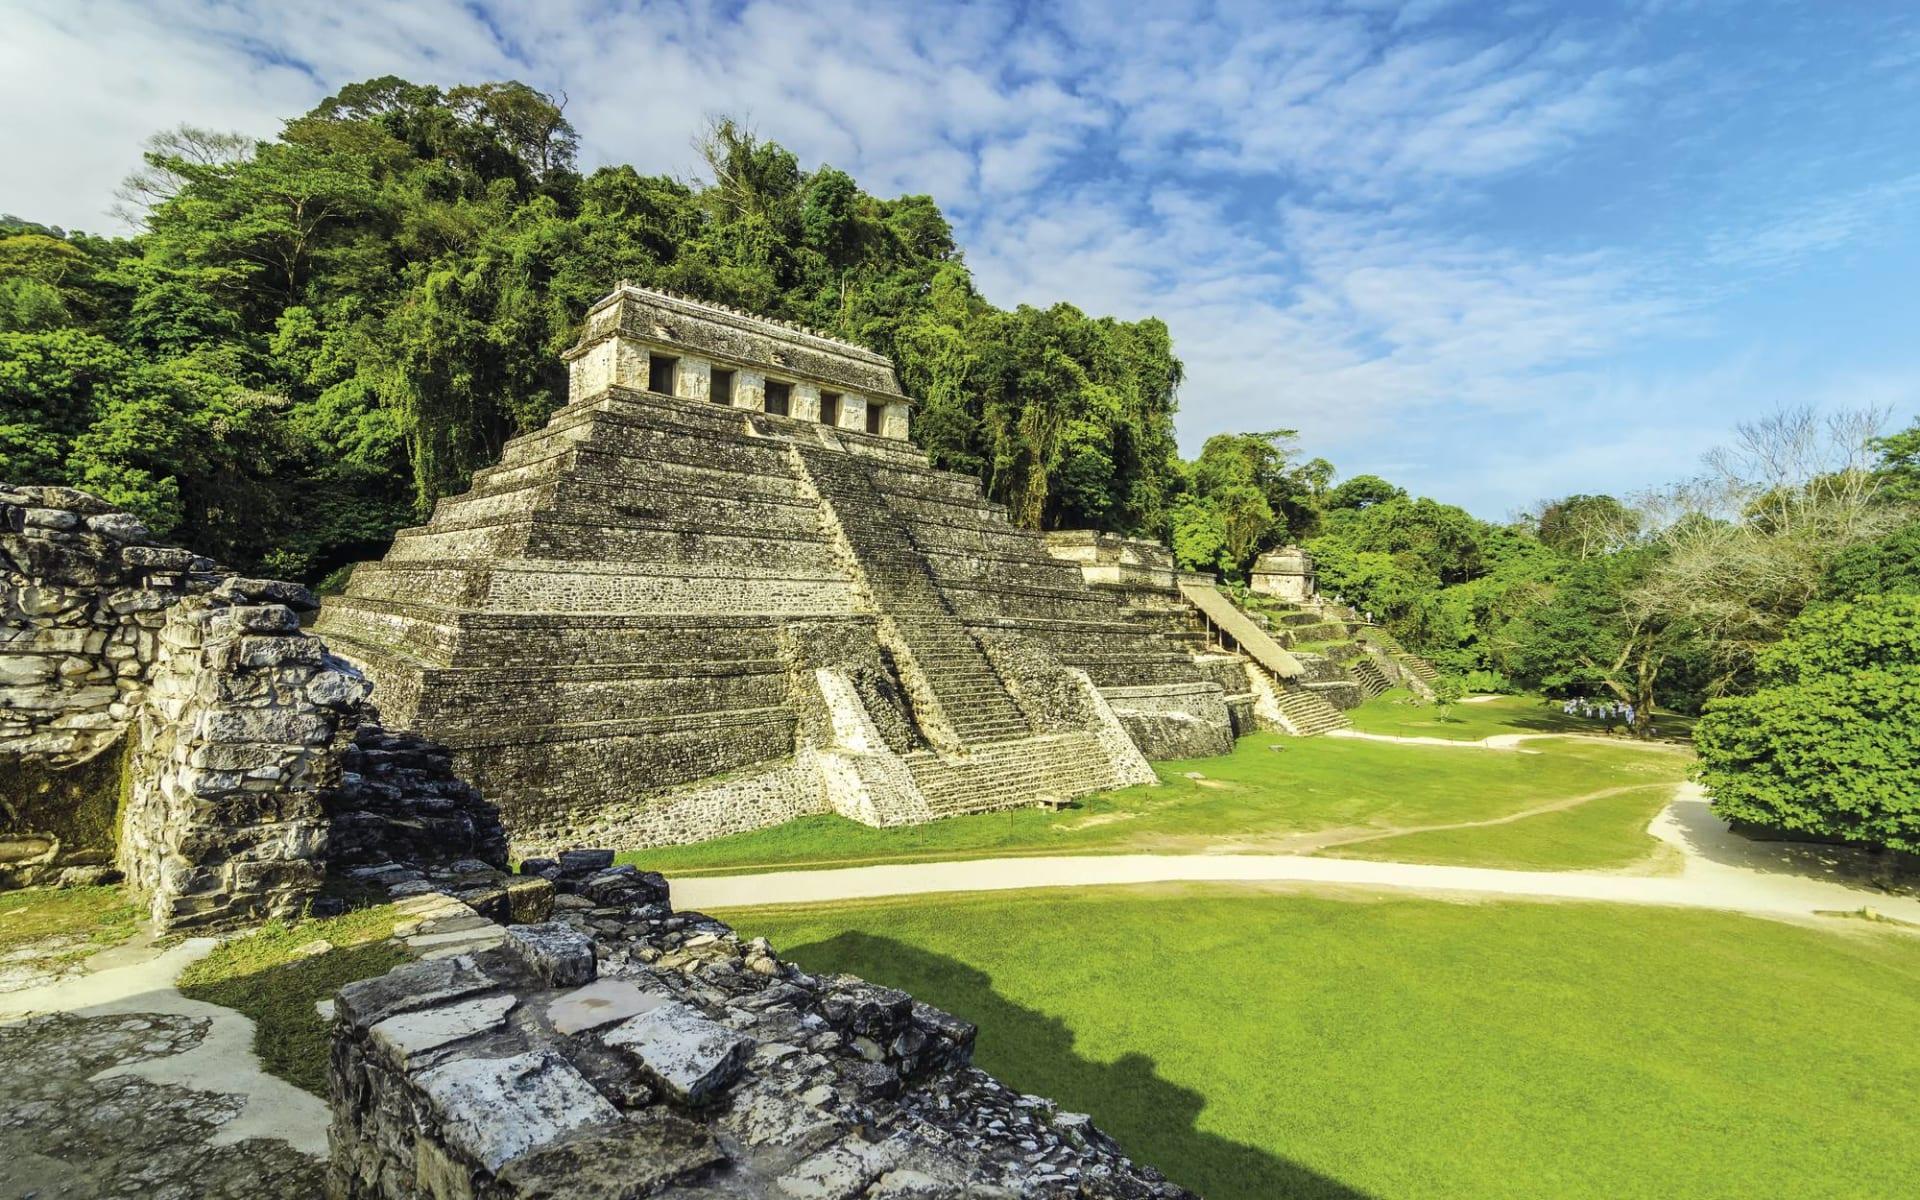 Gruppenreise Das Erbe der Maya ab Cancun: Mexiko - Palenque - Maya Tempel